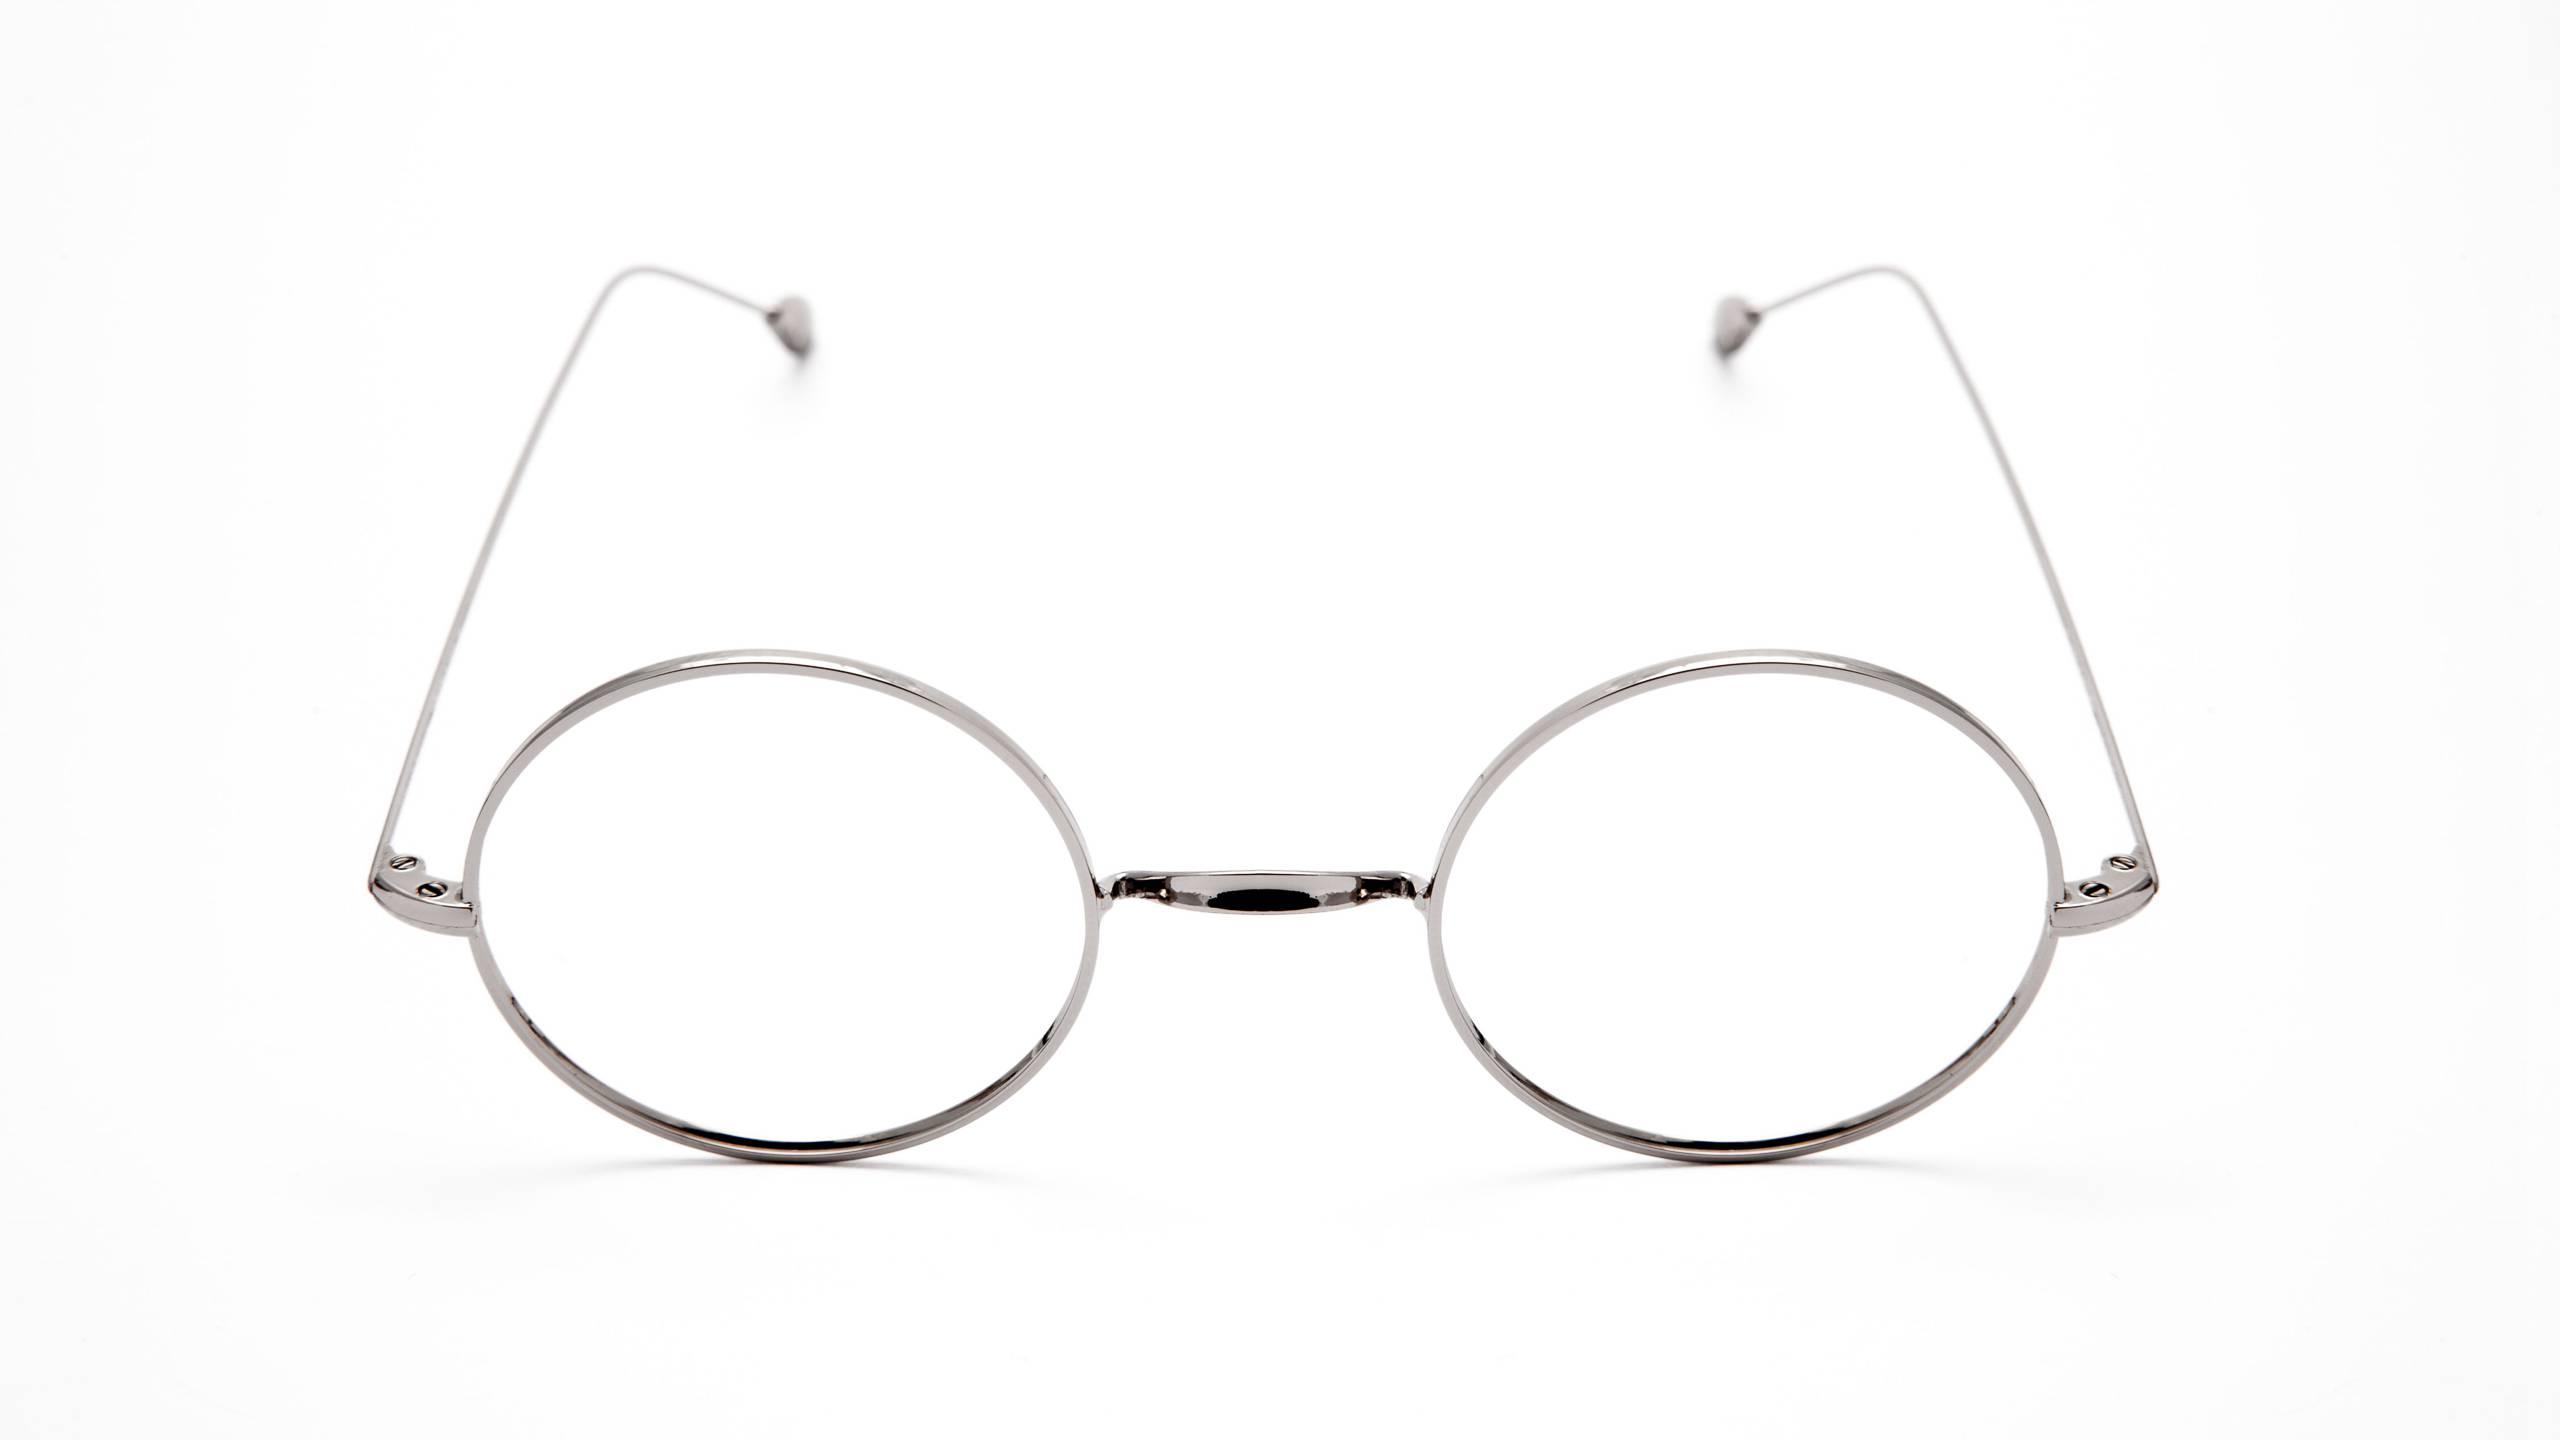 eyeglasses-Nathan-Kaltermann-made-in-Italy-ISCHIA-ARG-UNISEX-VISTA1